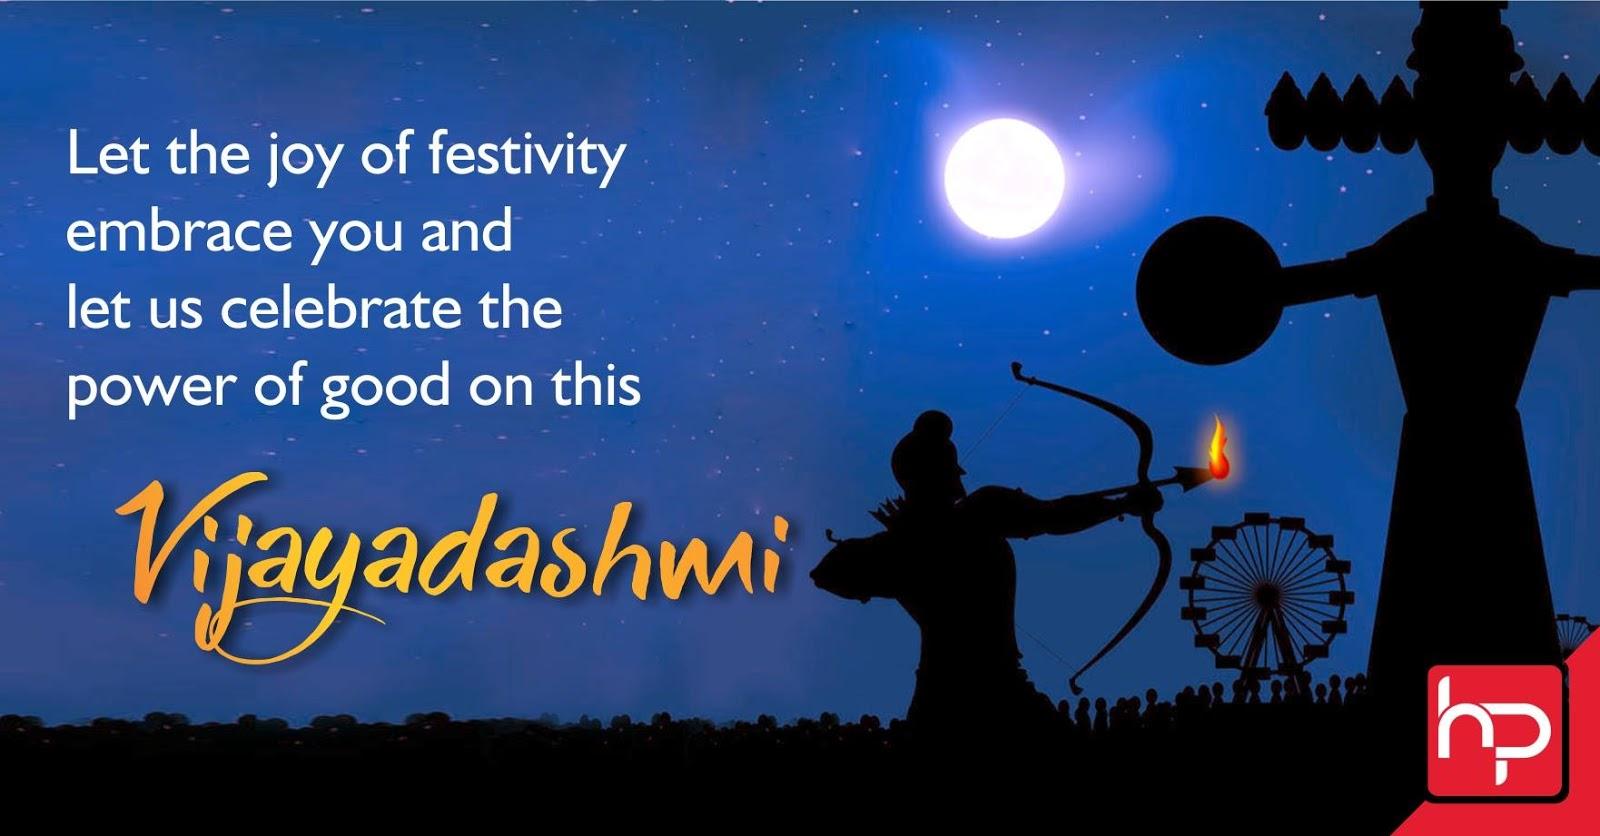 Vijayadashami Wishes Beautiful Image